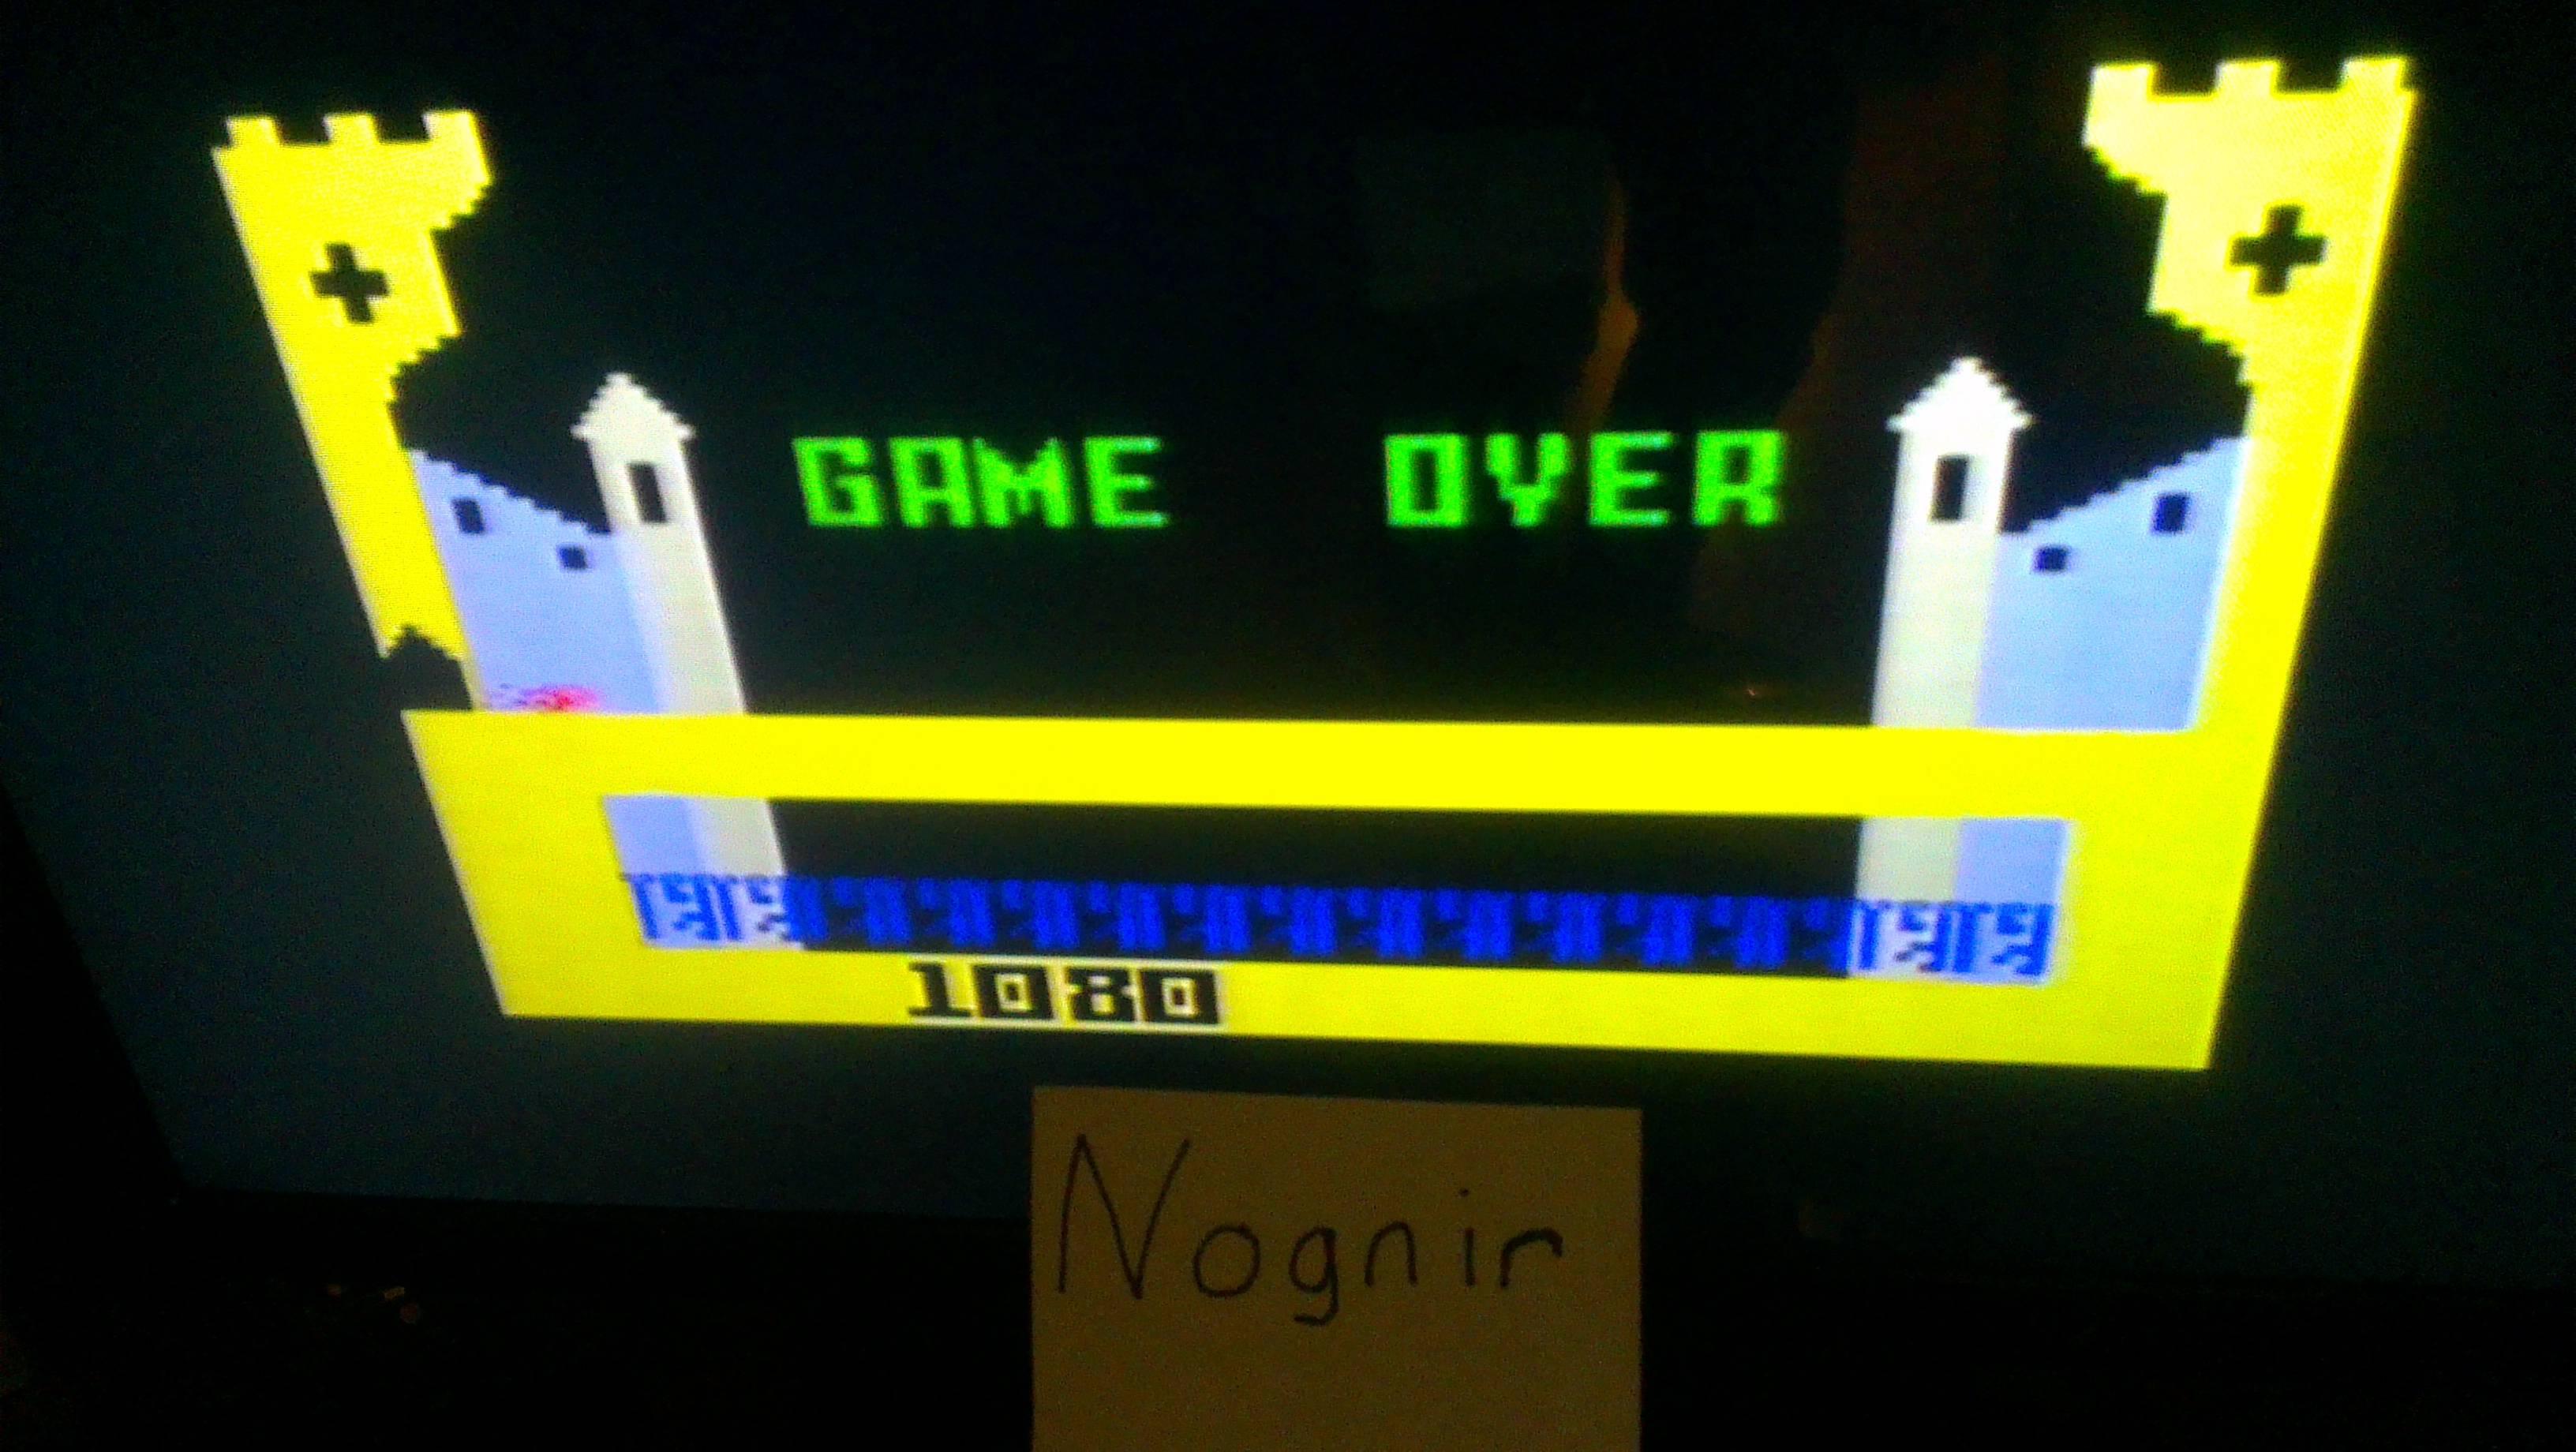 Nognir: Dragonfire (Intellivision) 1,080 points on 2014-02-09 17:15:02